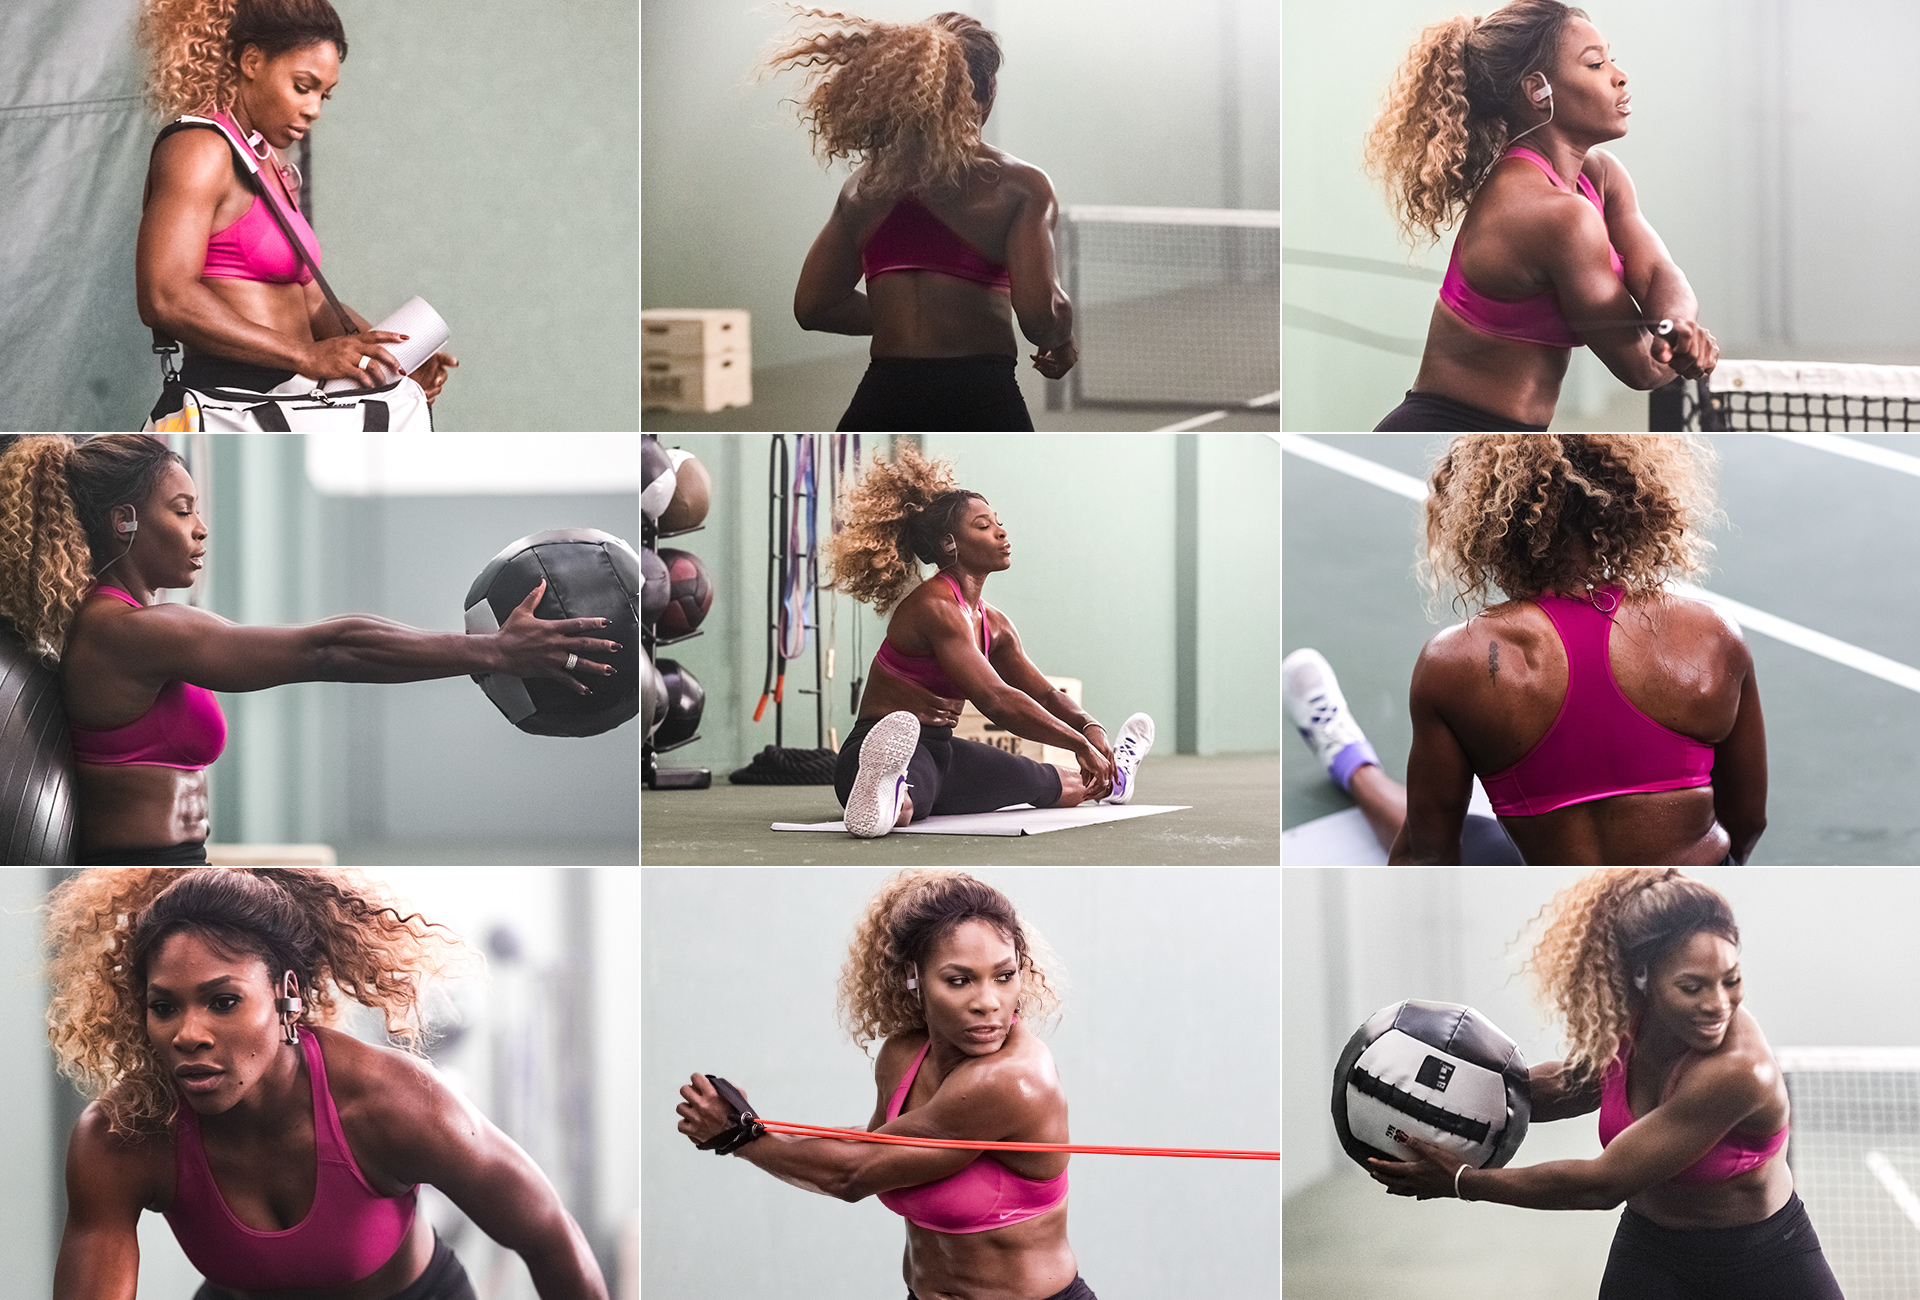 Serena_05